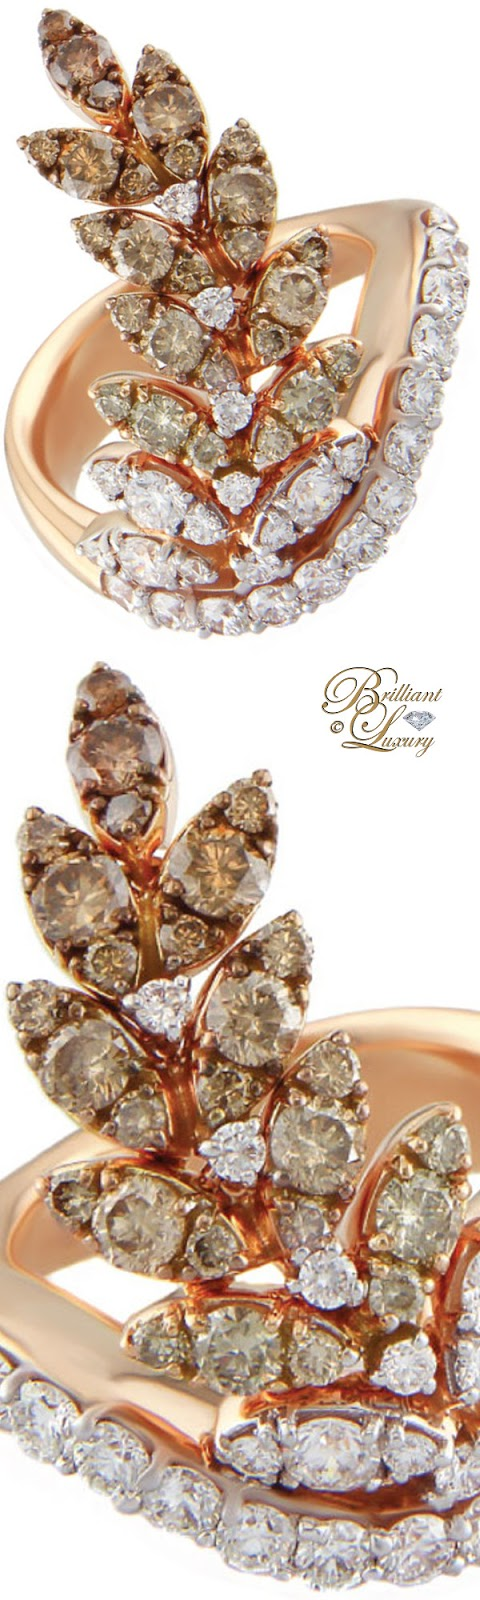 Brilliant Luxury ♦ Alessa Leaf Ring With Diamonds